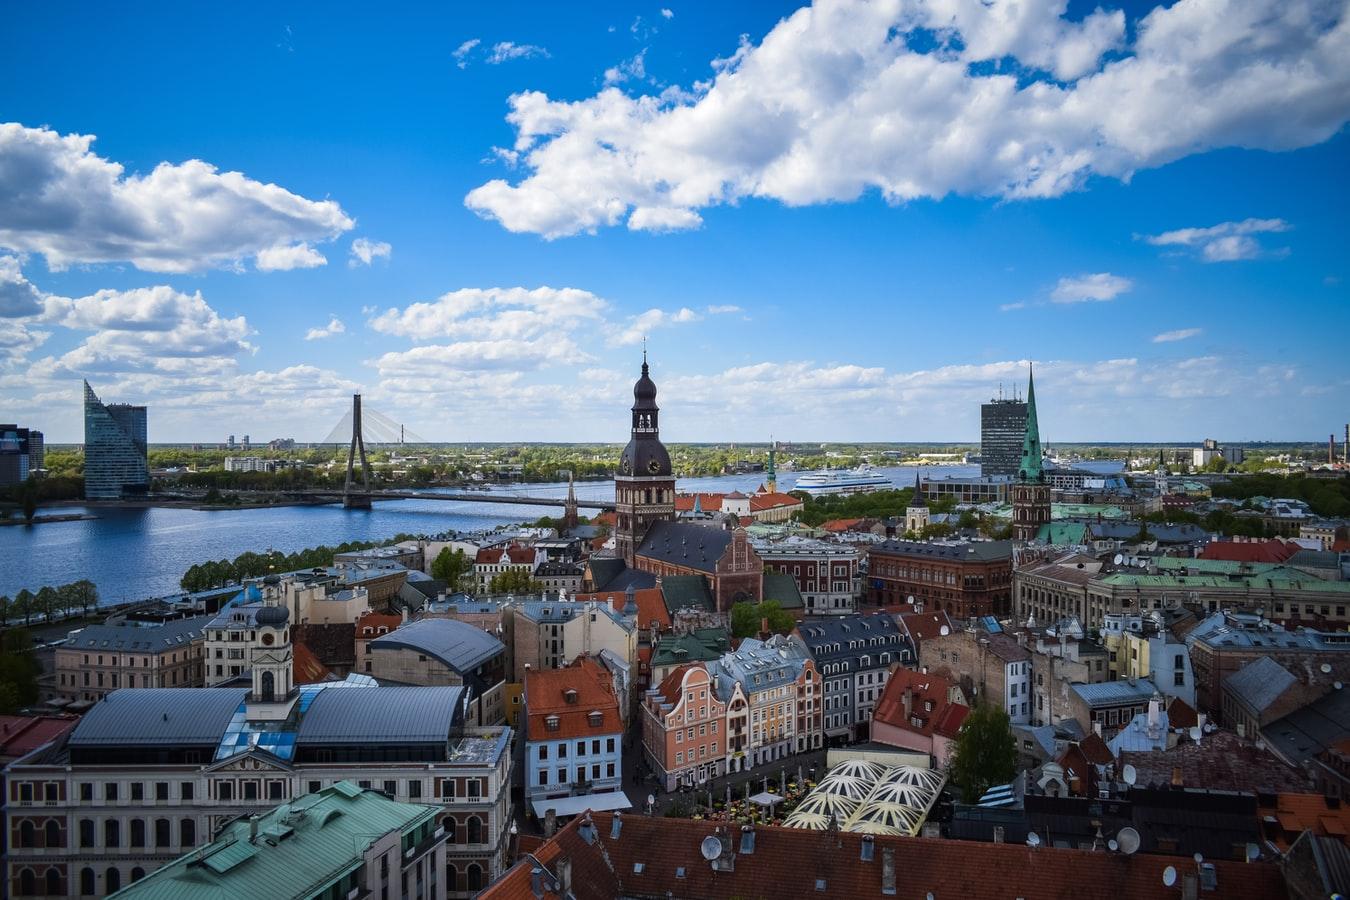 Auslandspraktikum in Lettland - RIga